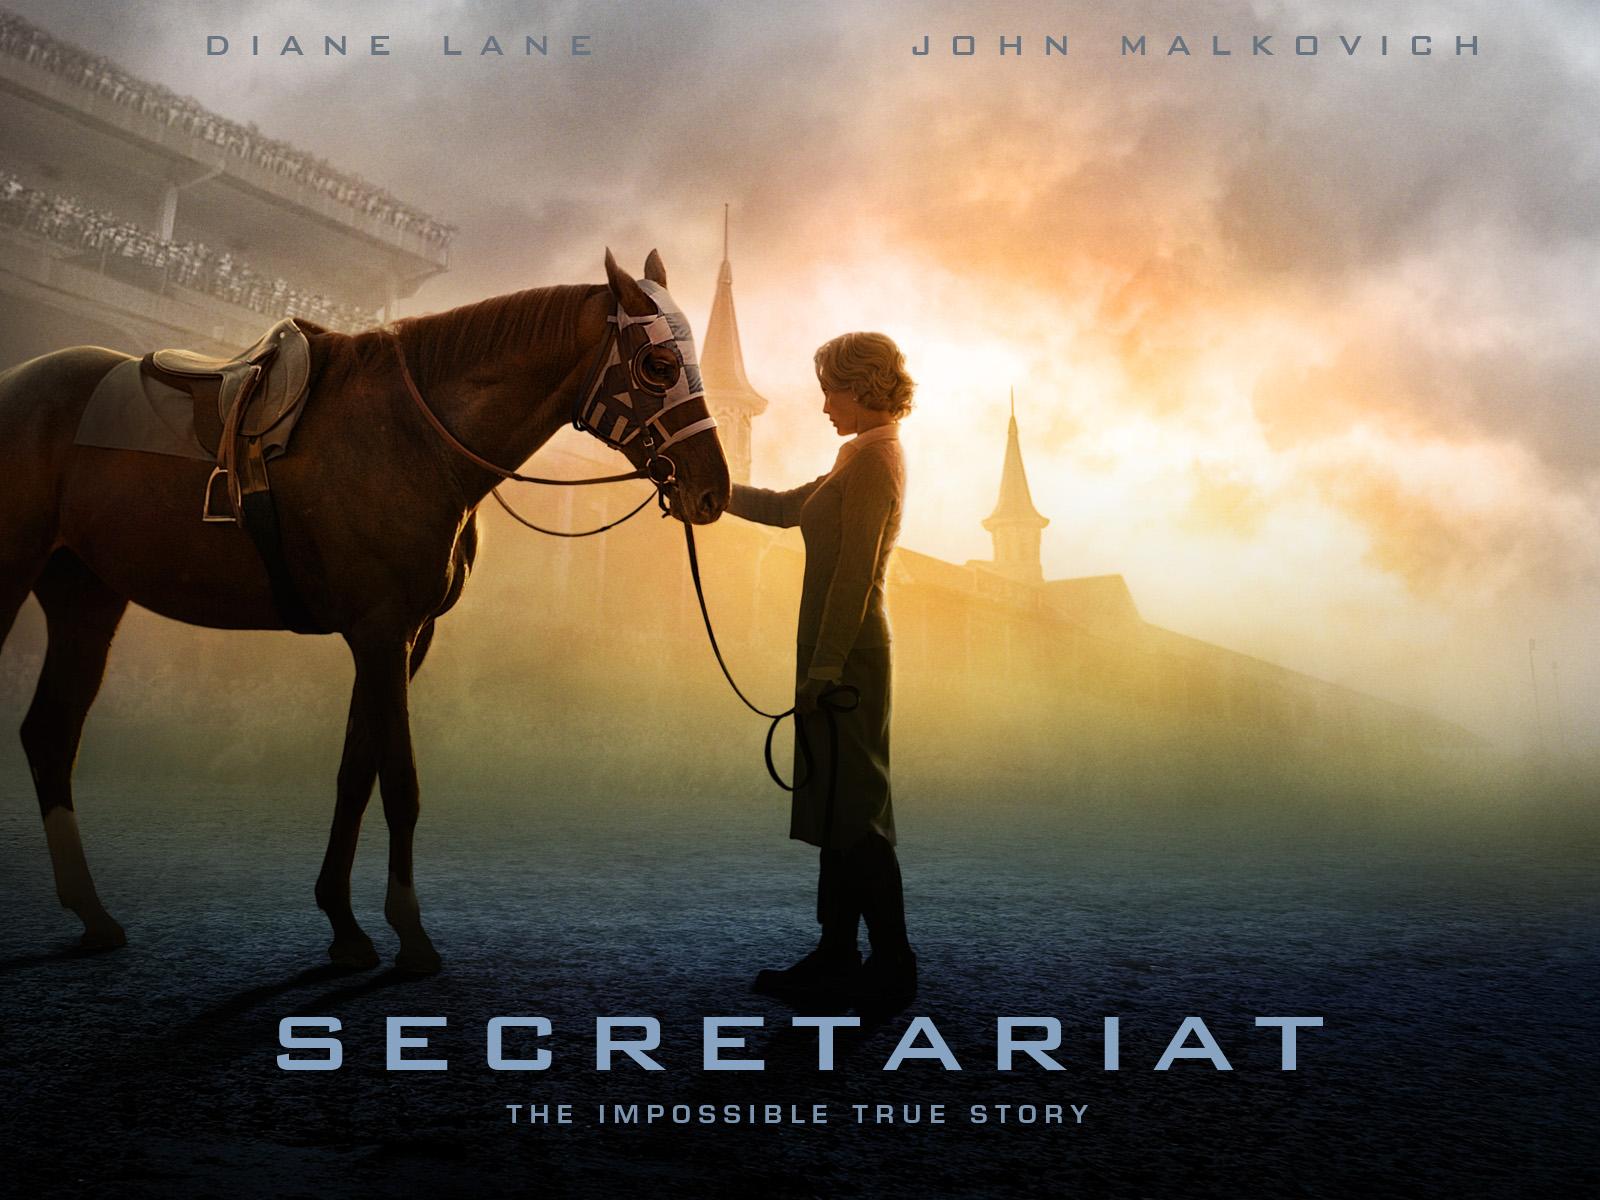 Fond d 39 cran gratuit film secr tariat secretariat disney - Film disney gratuit ...